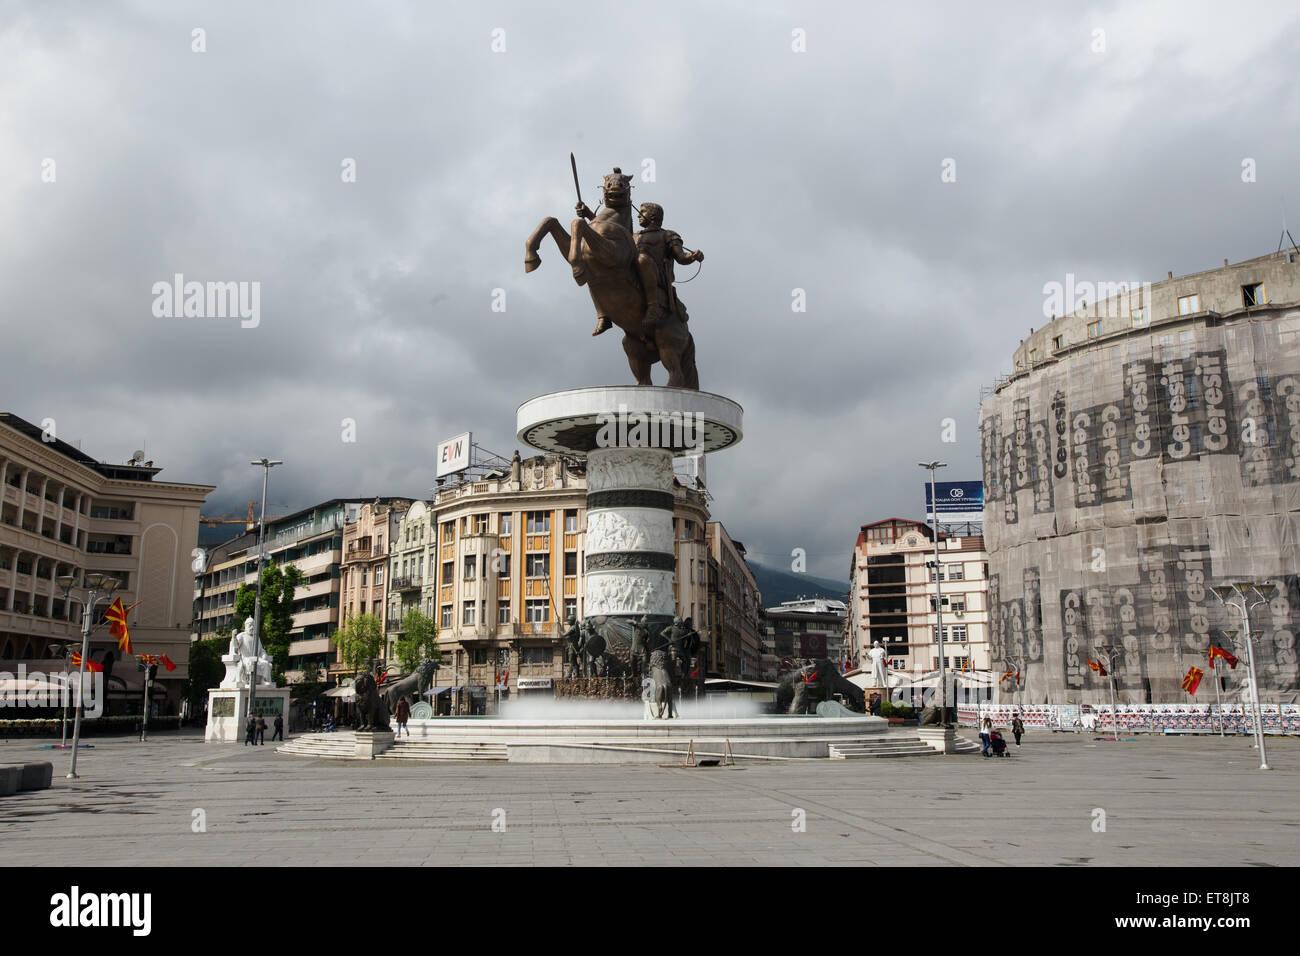 Statue of Alexander the Great Skopje Macedonia - Stock Image